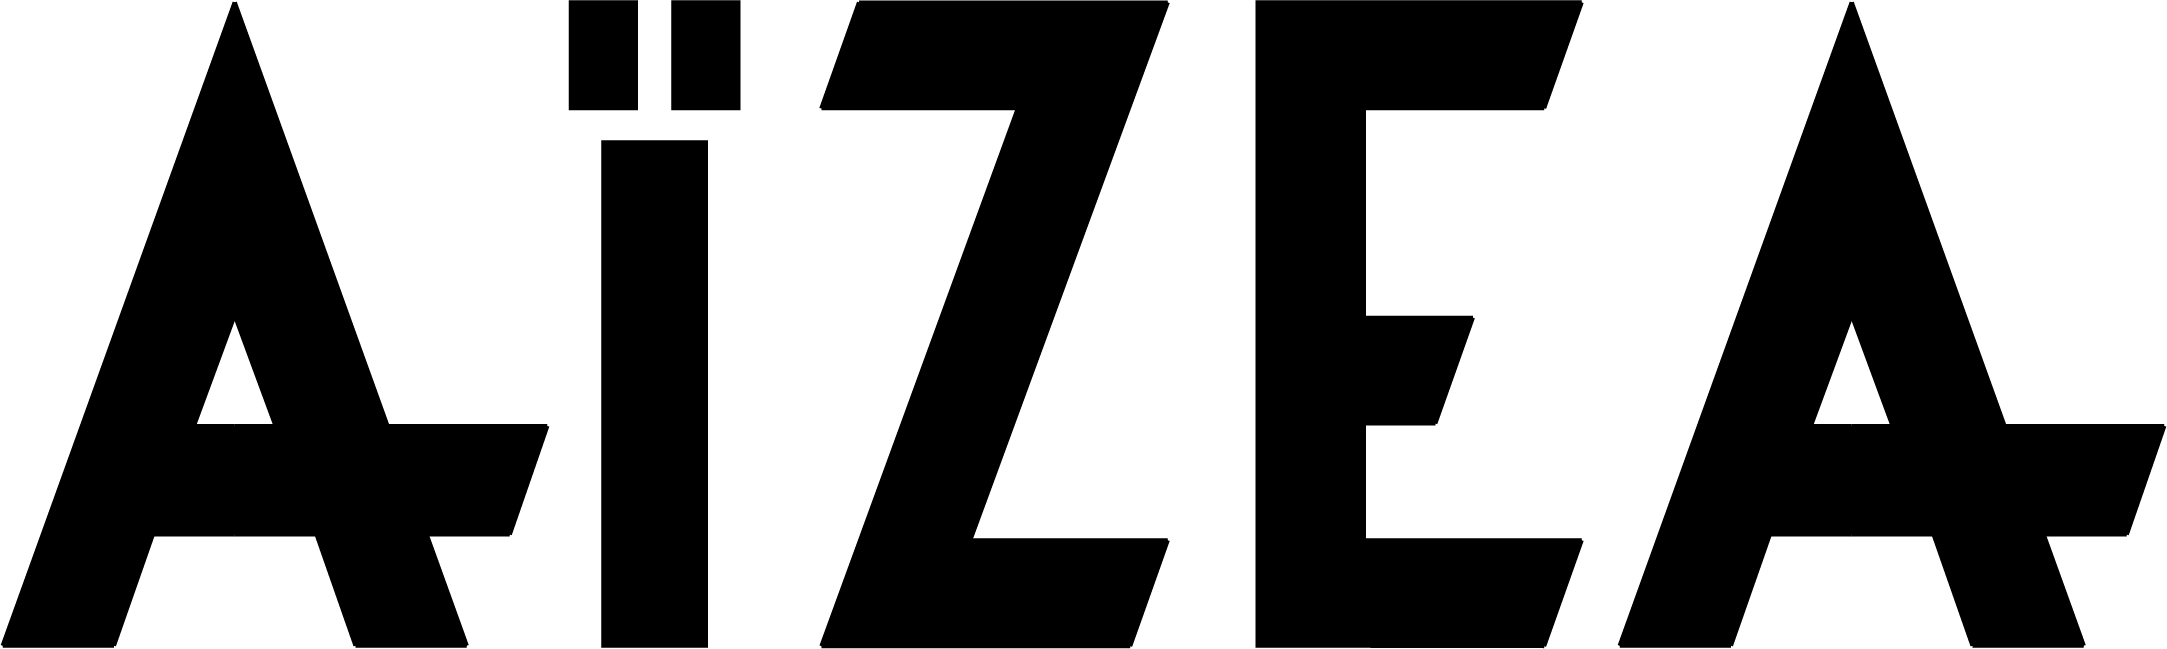 AïZEA Icon